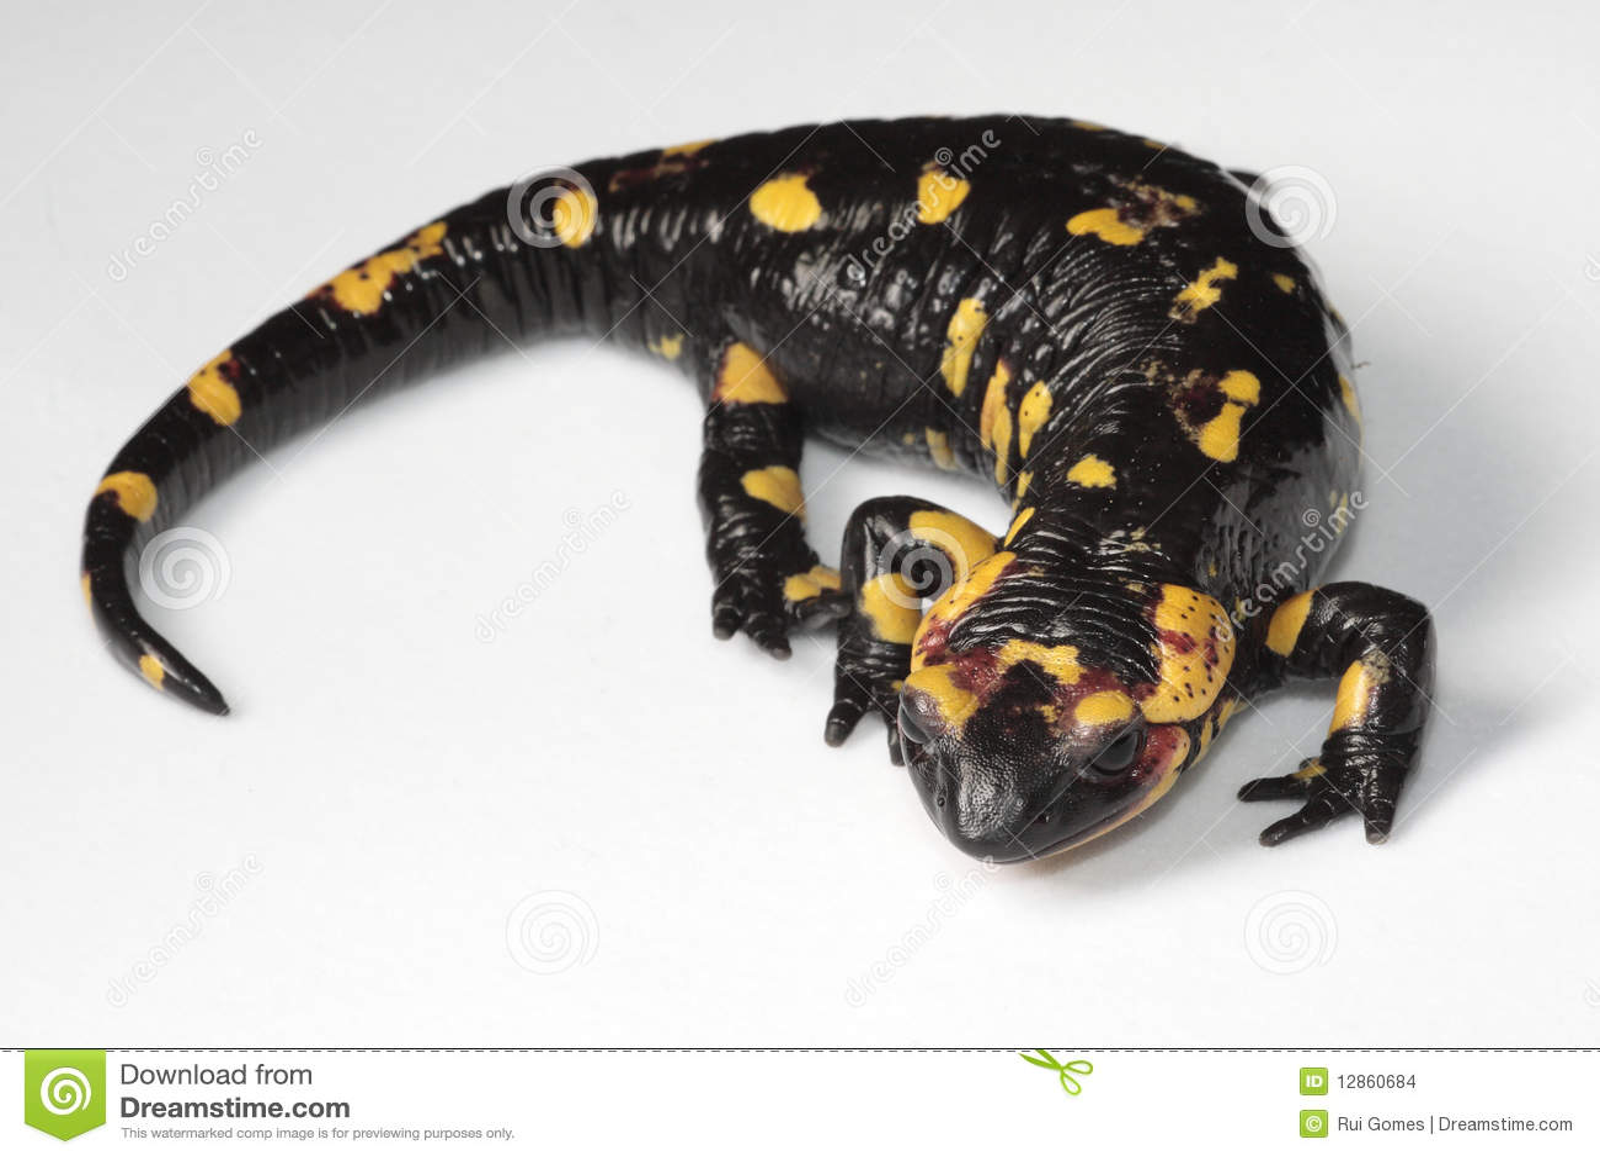 salamander white background - photo #10